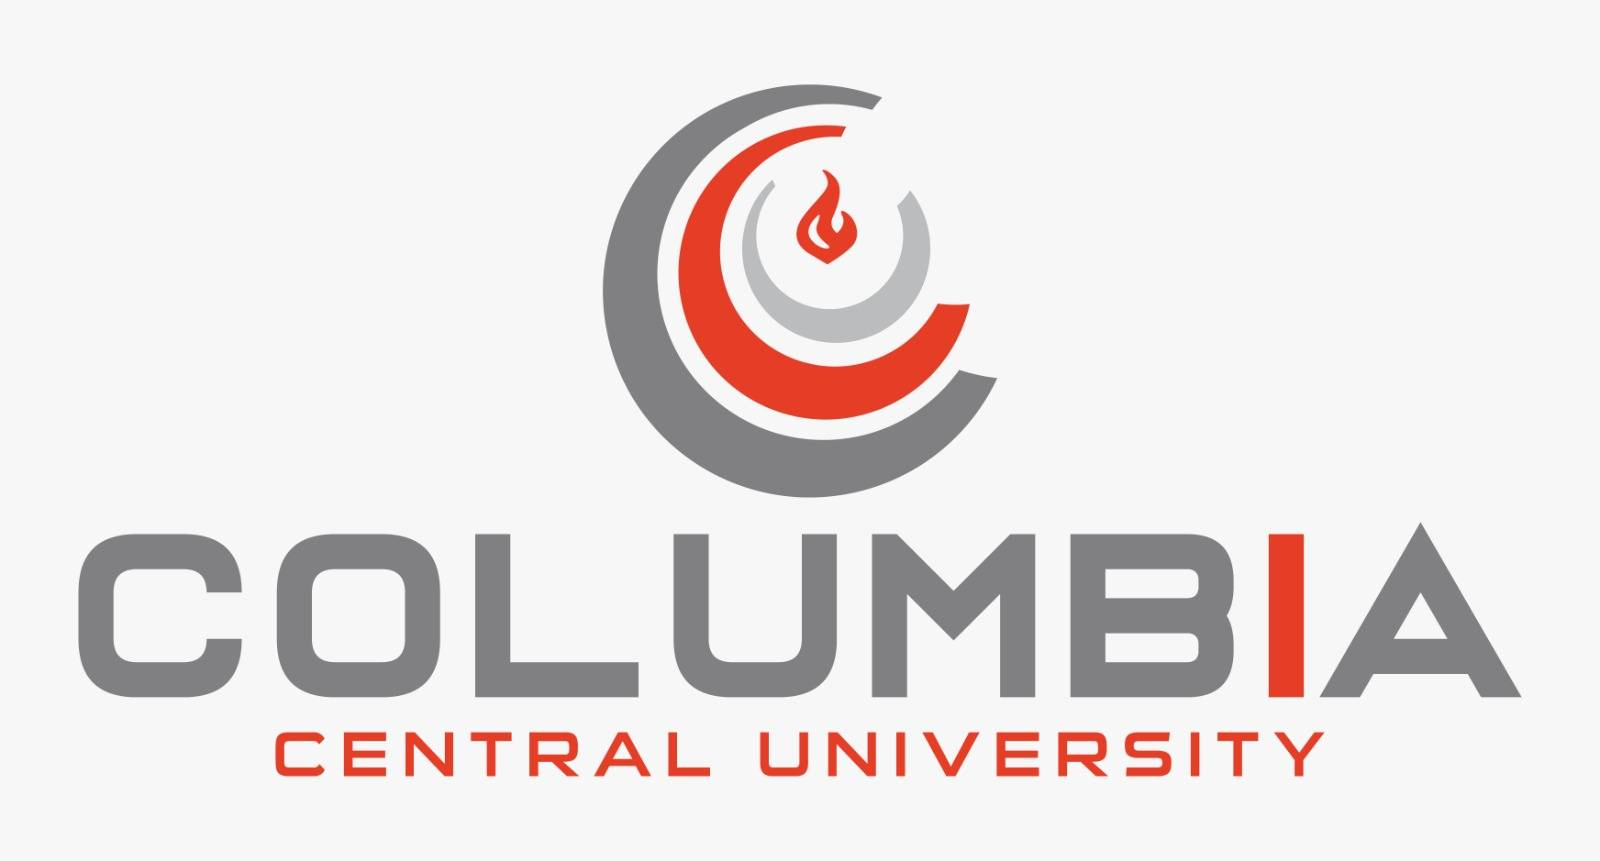 Columbia Central University